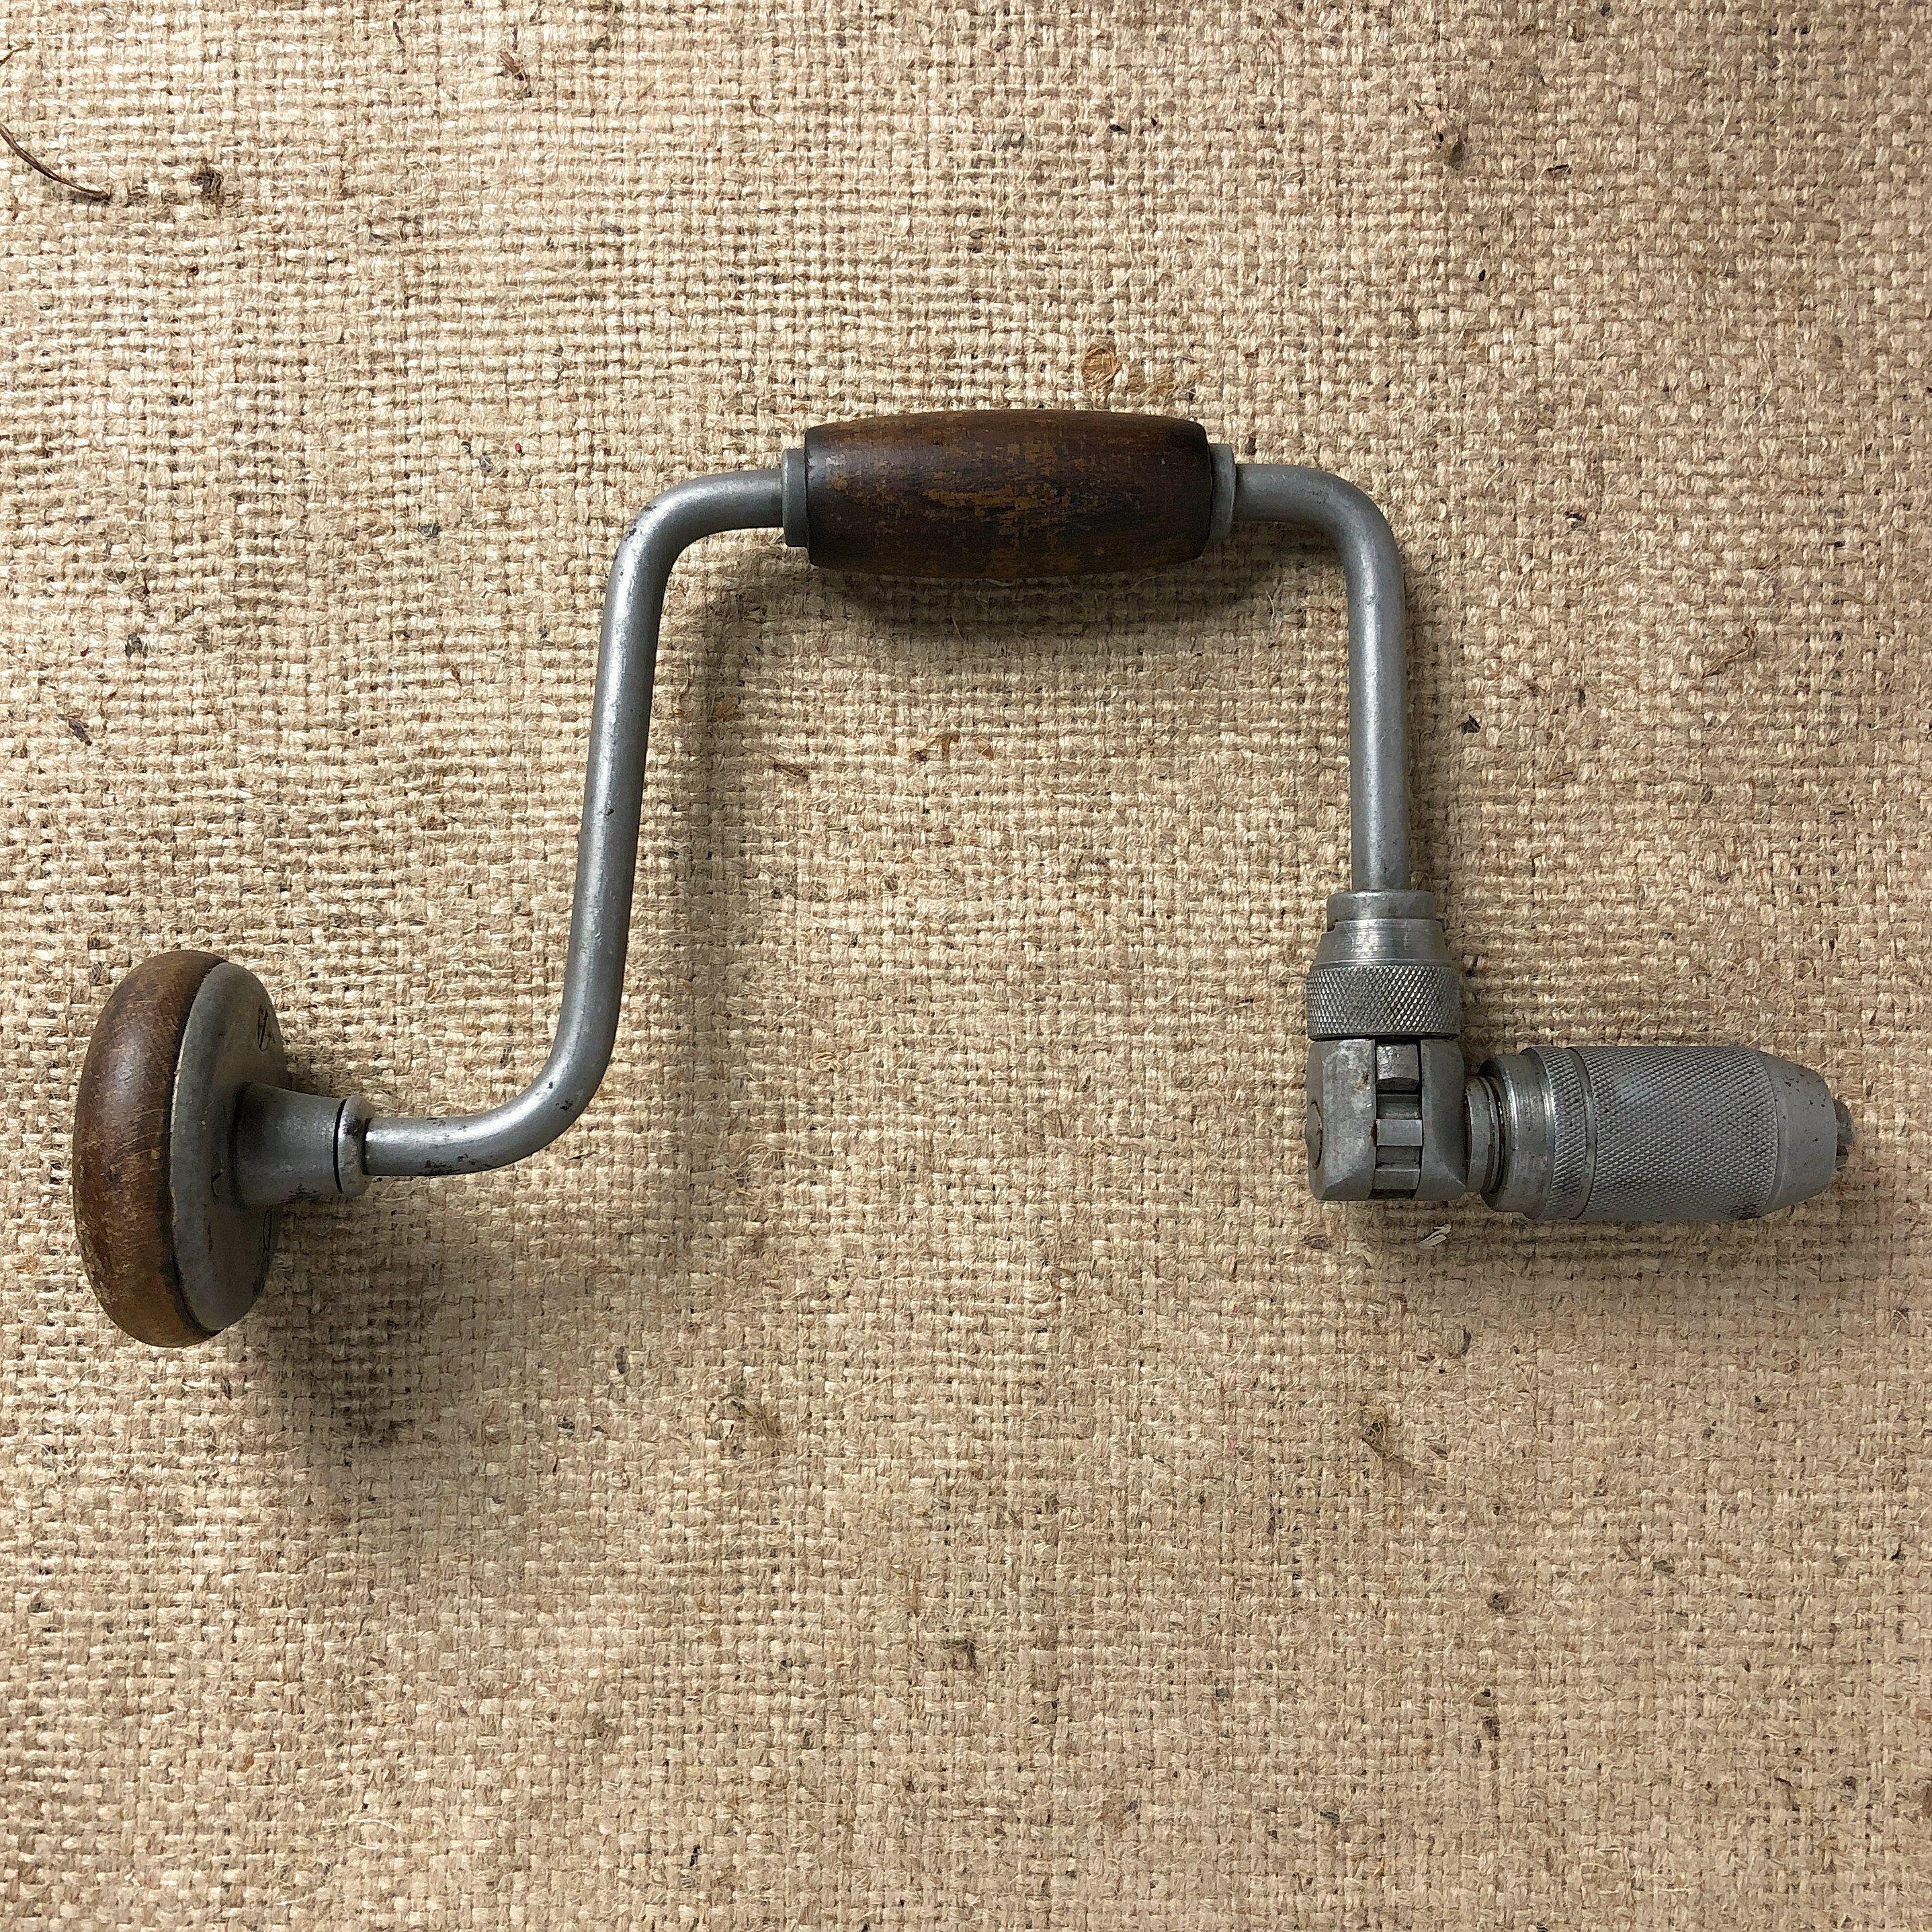 Vintage Brace Bit Hand Drill Made In